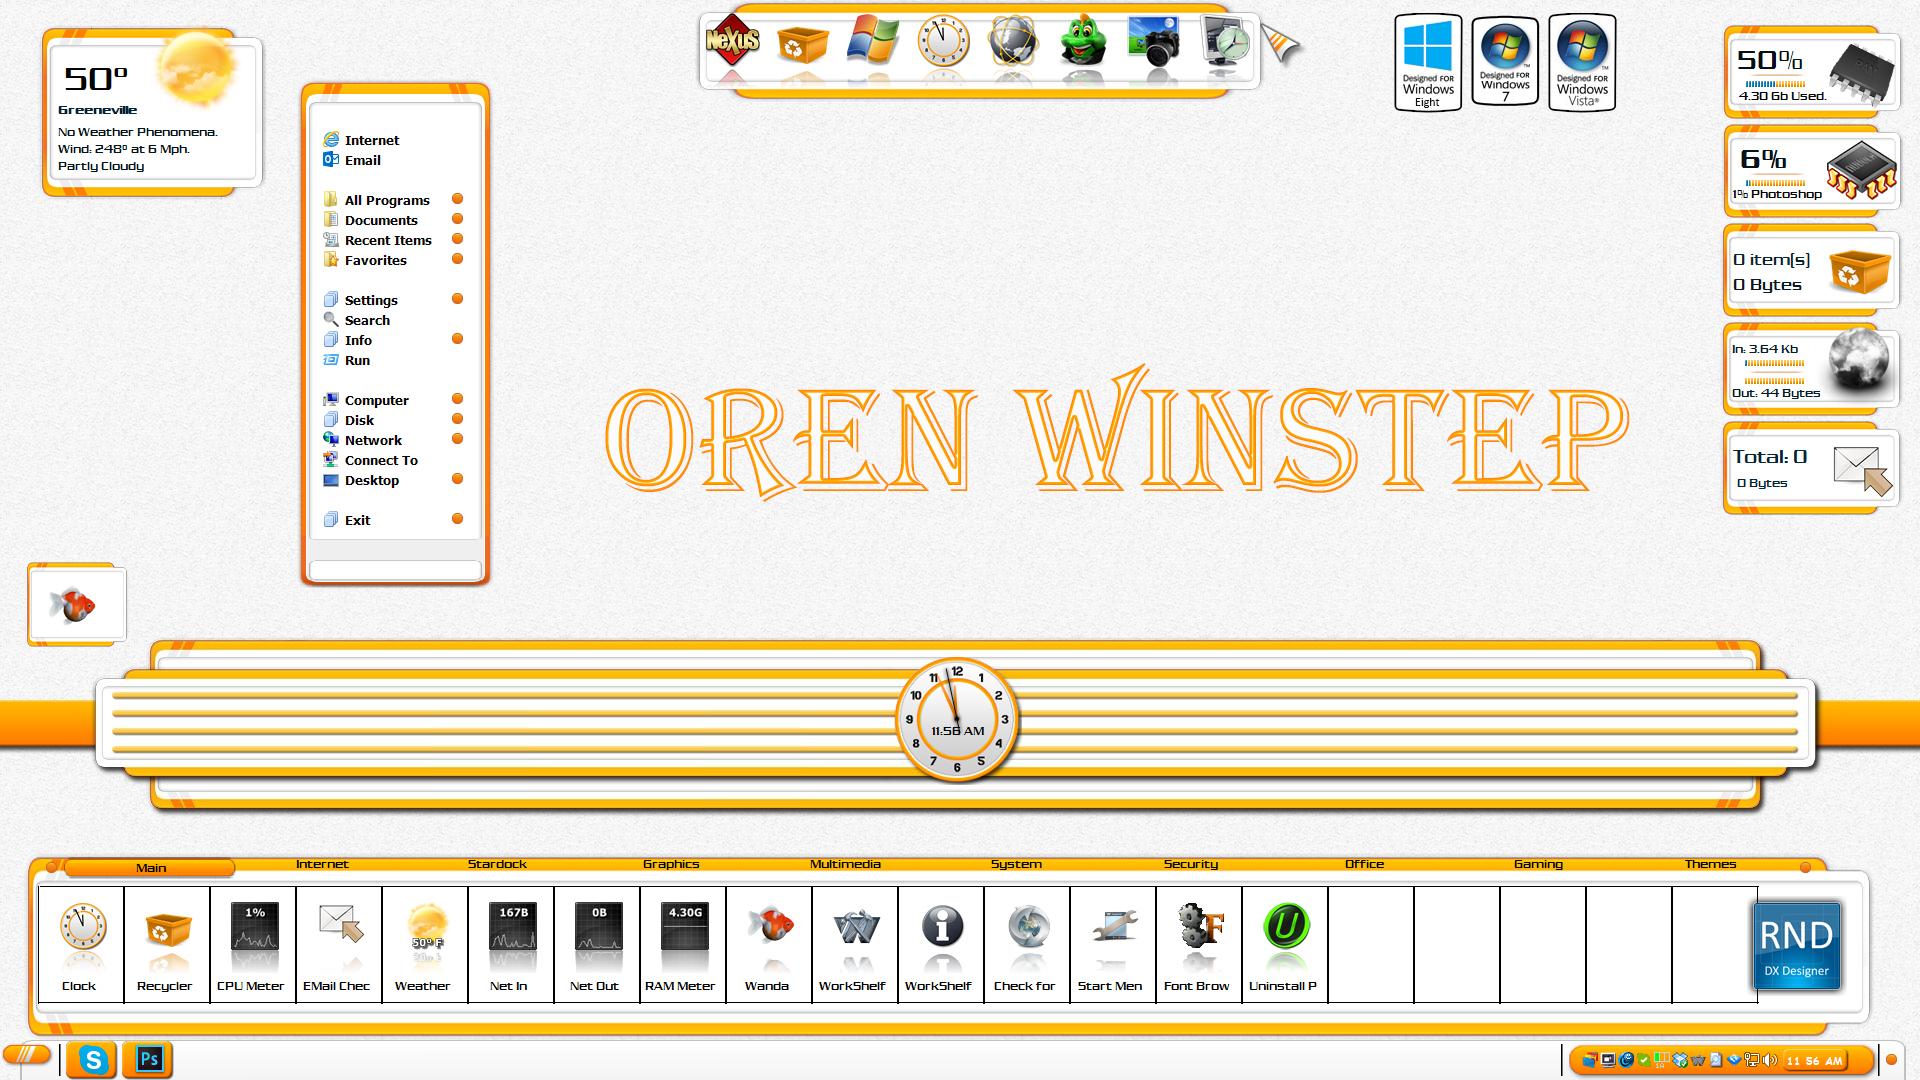 Oren Winstep